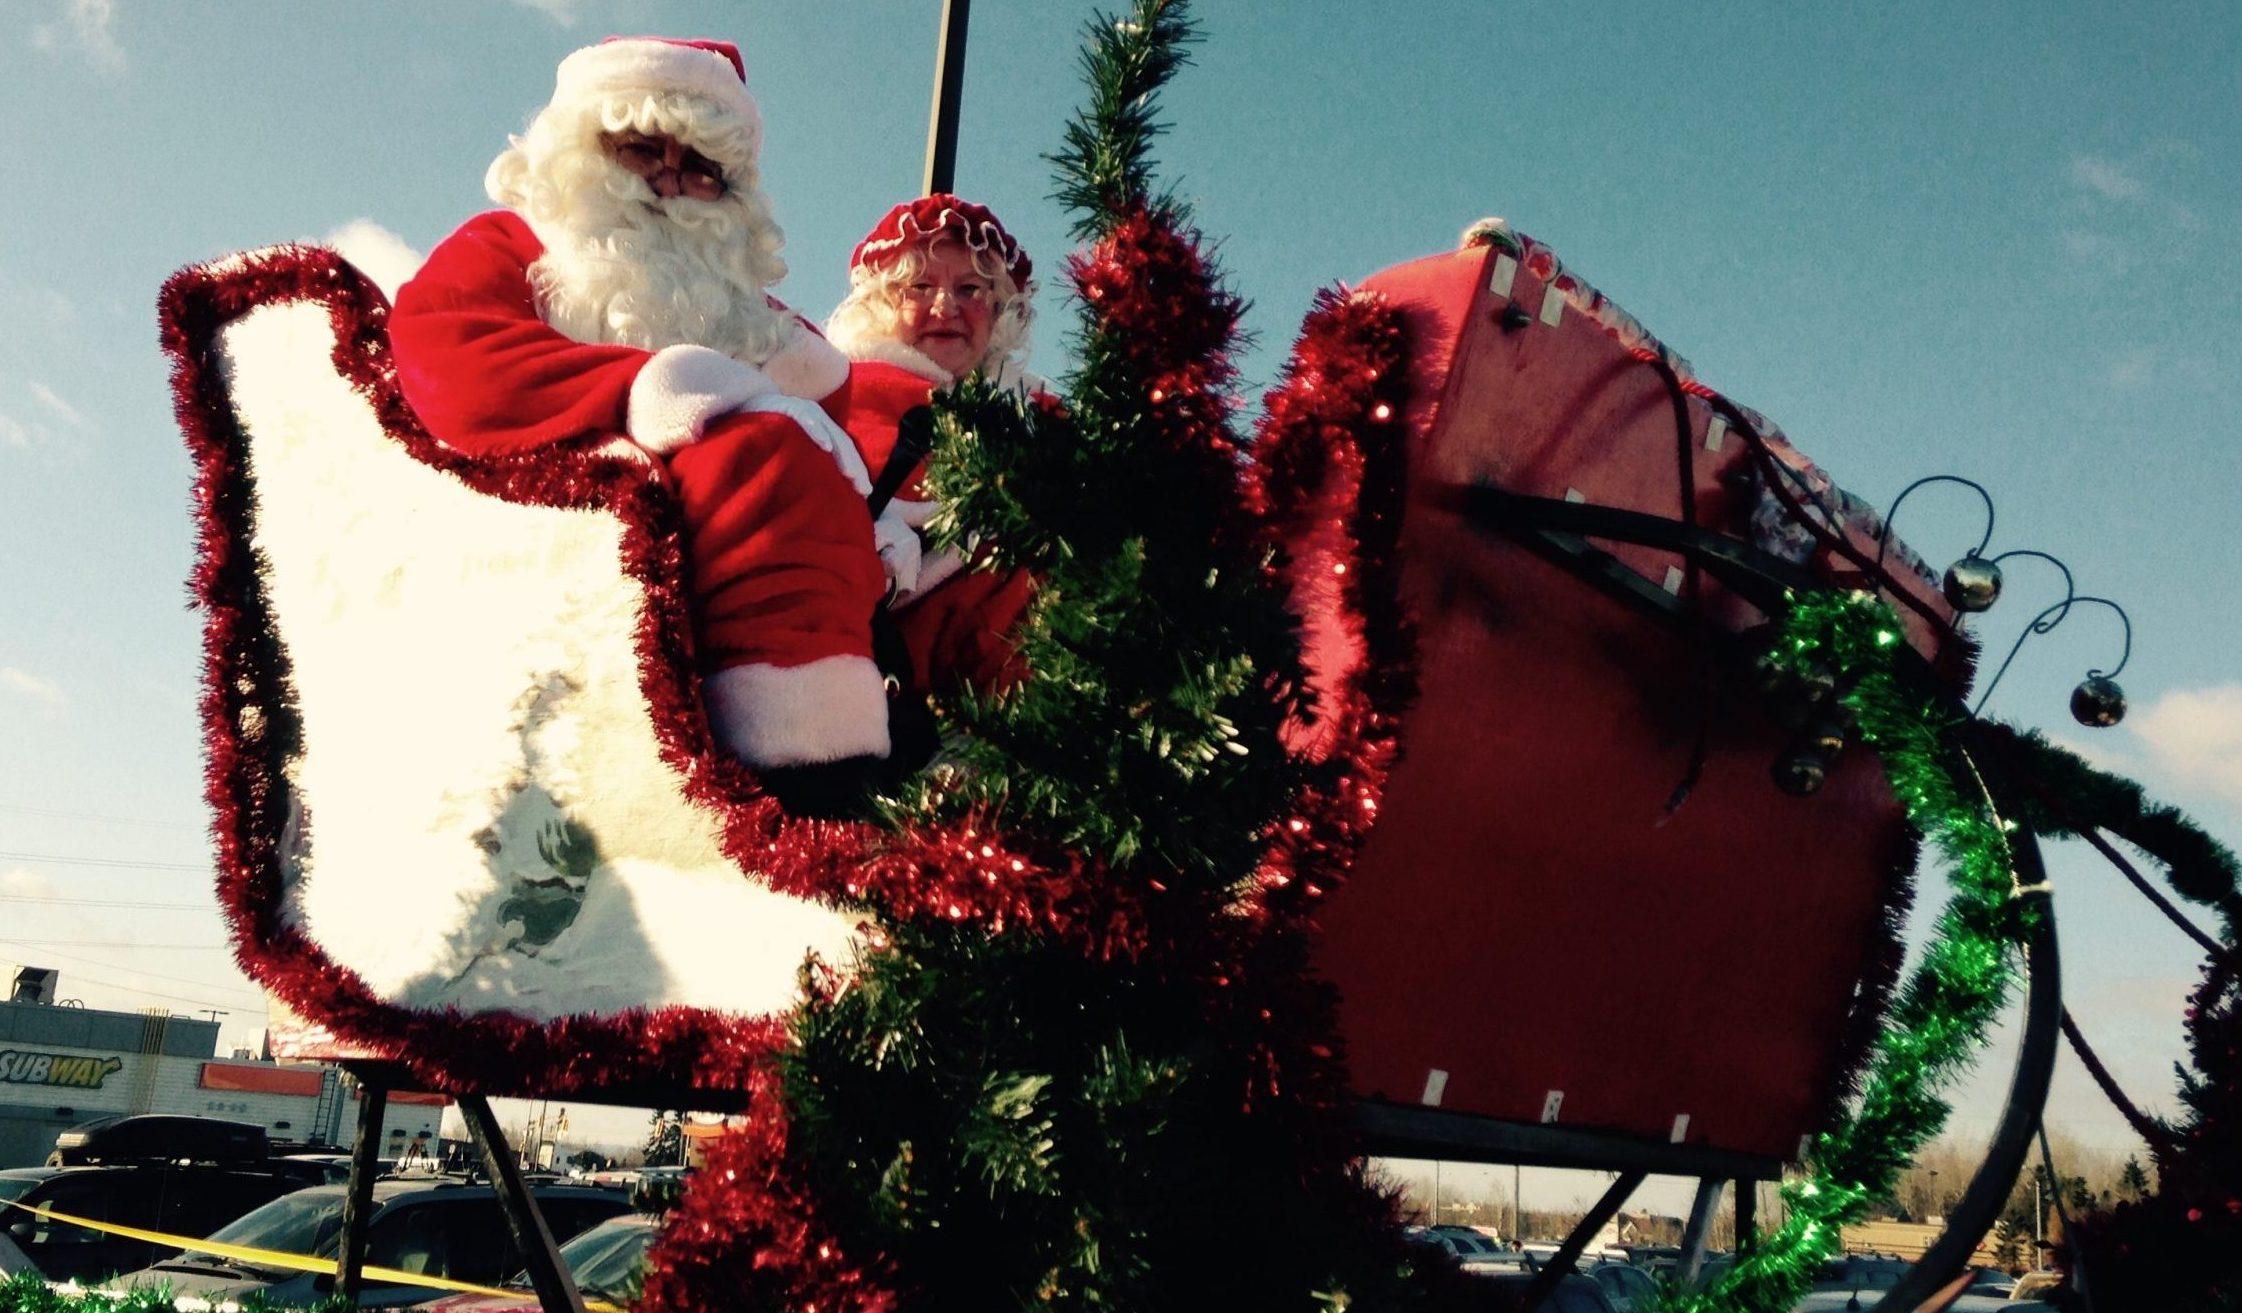 Rotary Christmas Parade This Morning